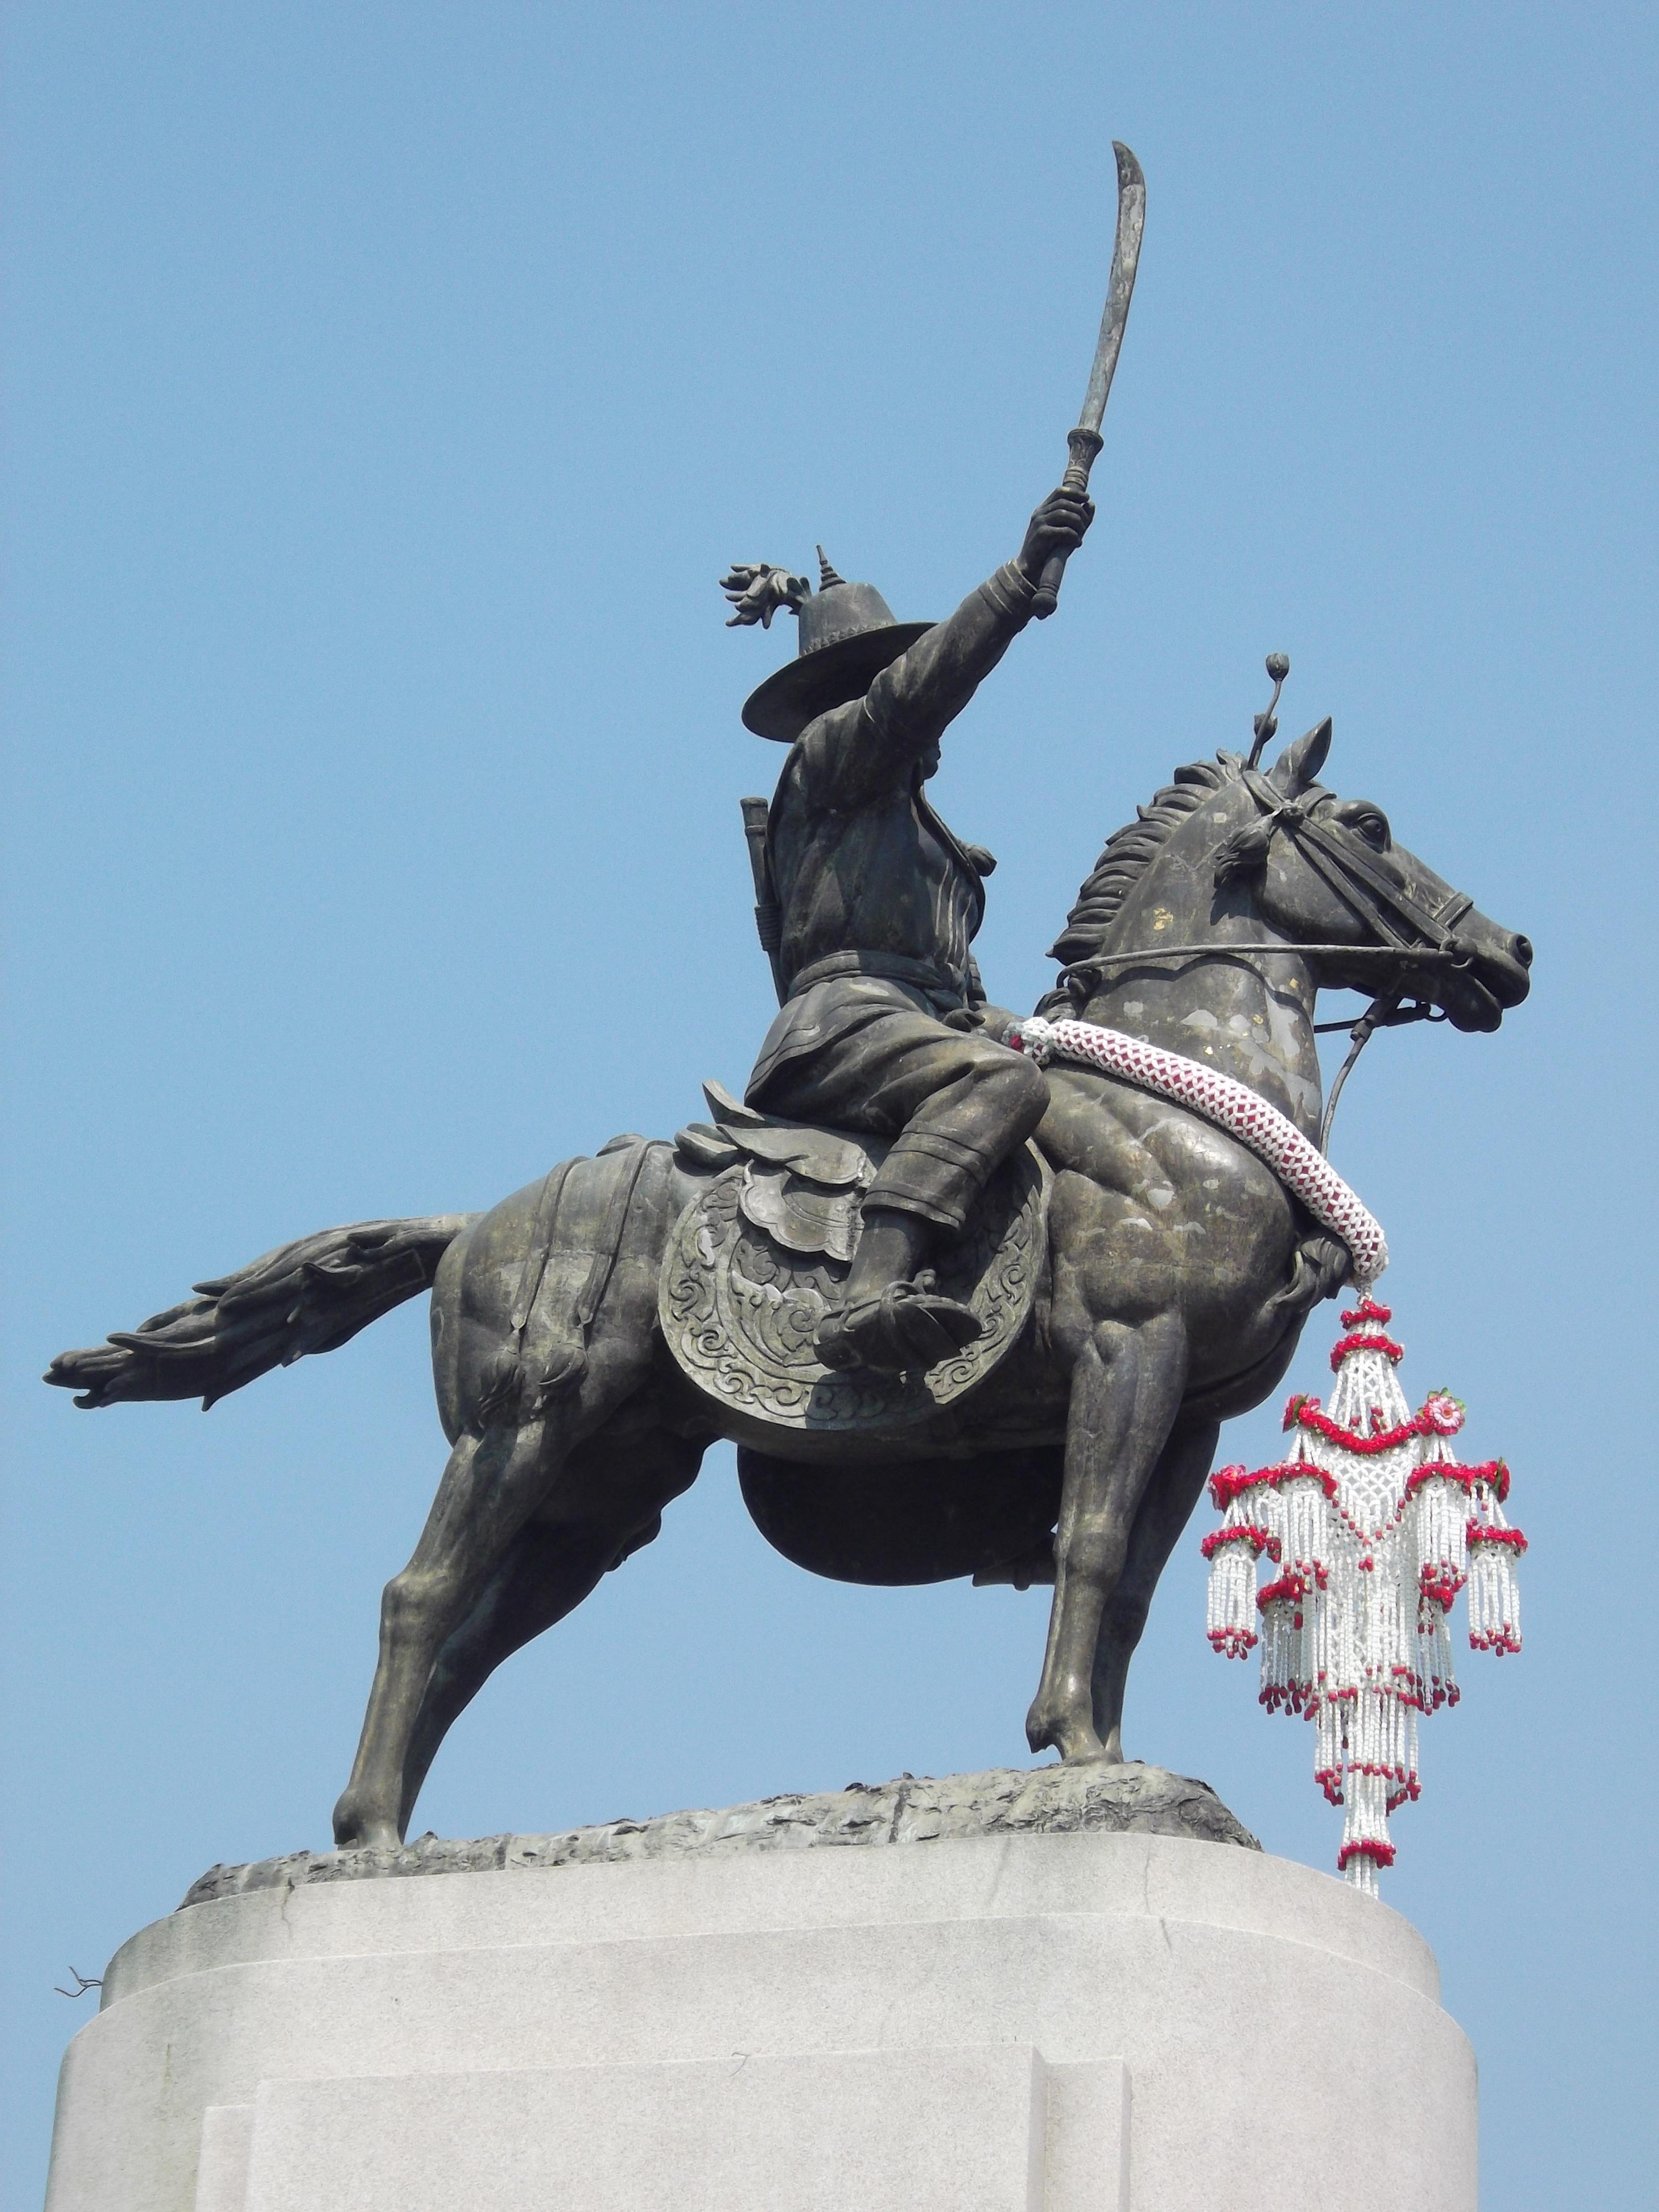 File:พระบรมราชานุสาวรีย์ สมเด็จพระเจ้าตากสินมหาราช เขตธนบุรี กรุงเทพมหานคร  (8).jpg - Wikimedia Commons